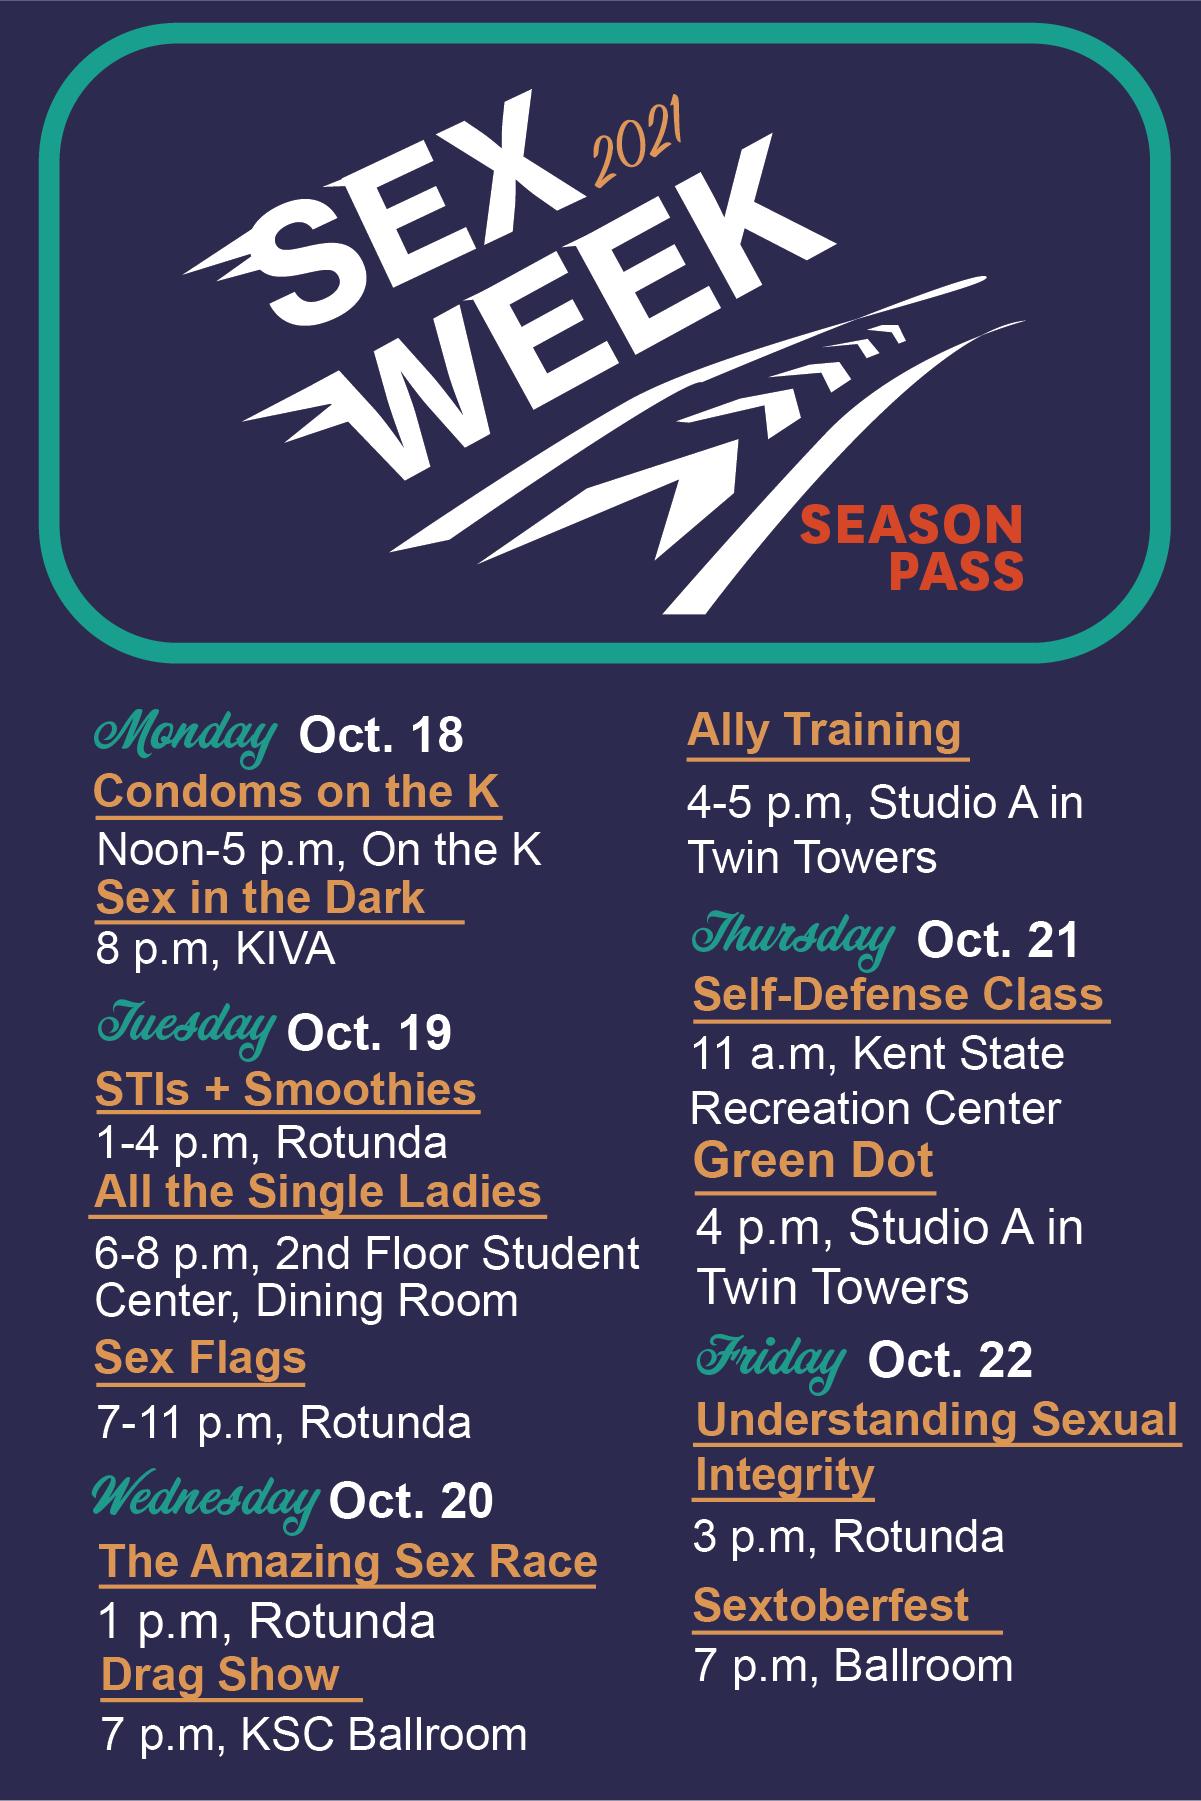 Sex Week2021 schedule